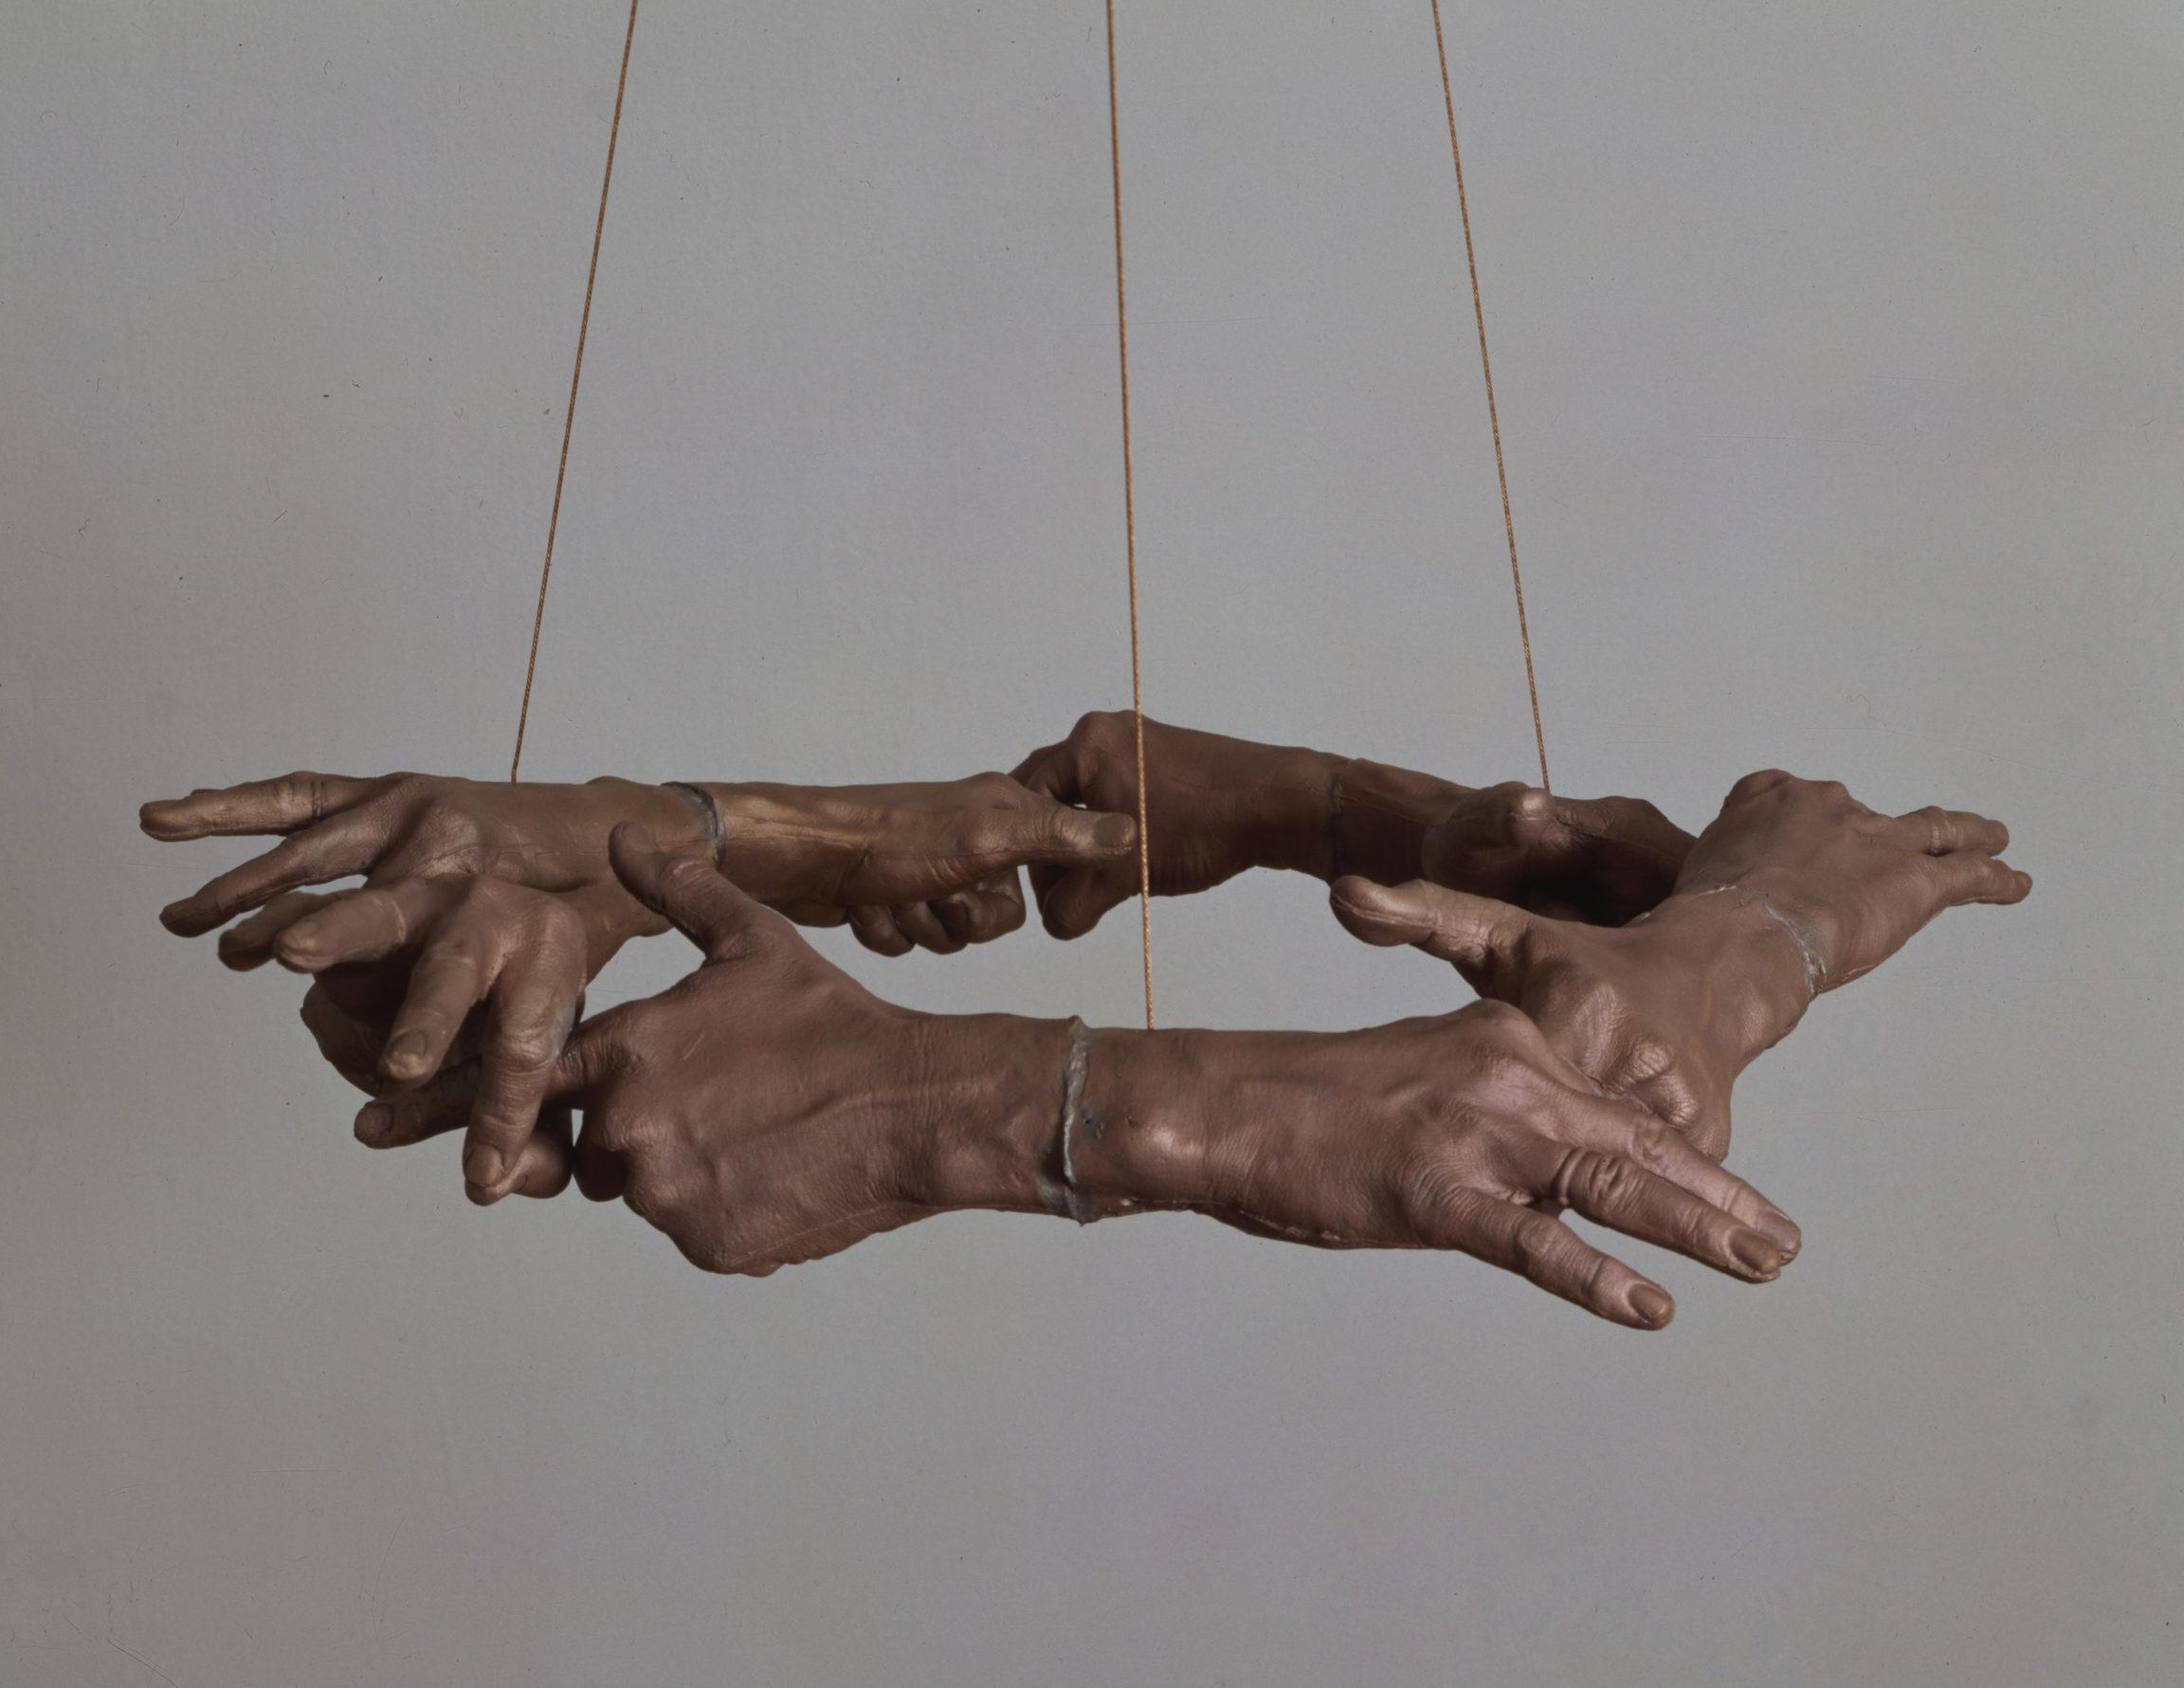 Bruce Nauman, Untitled (Hand Circle), 1996